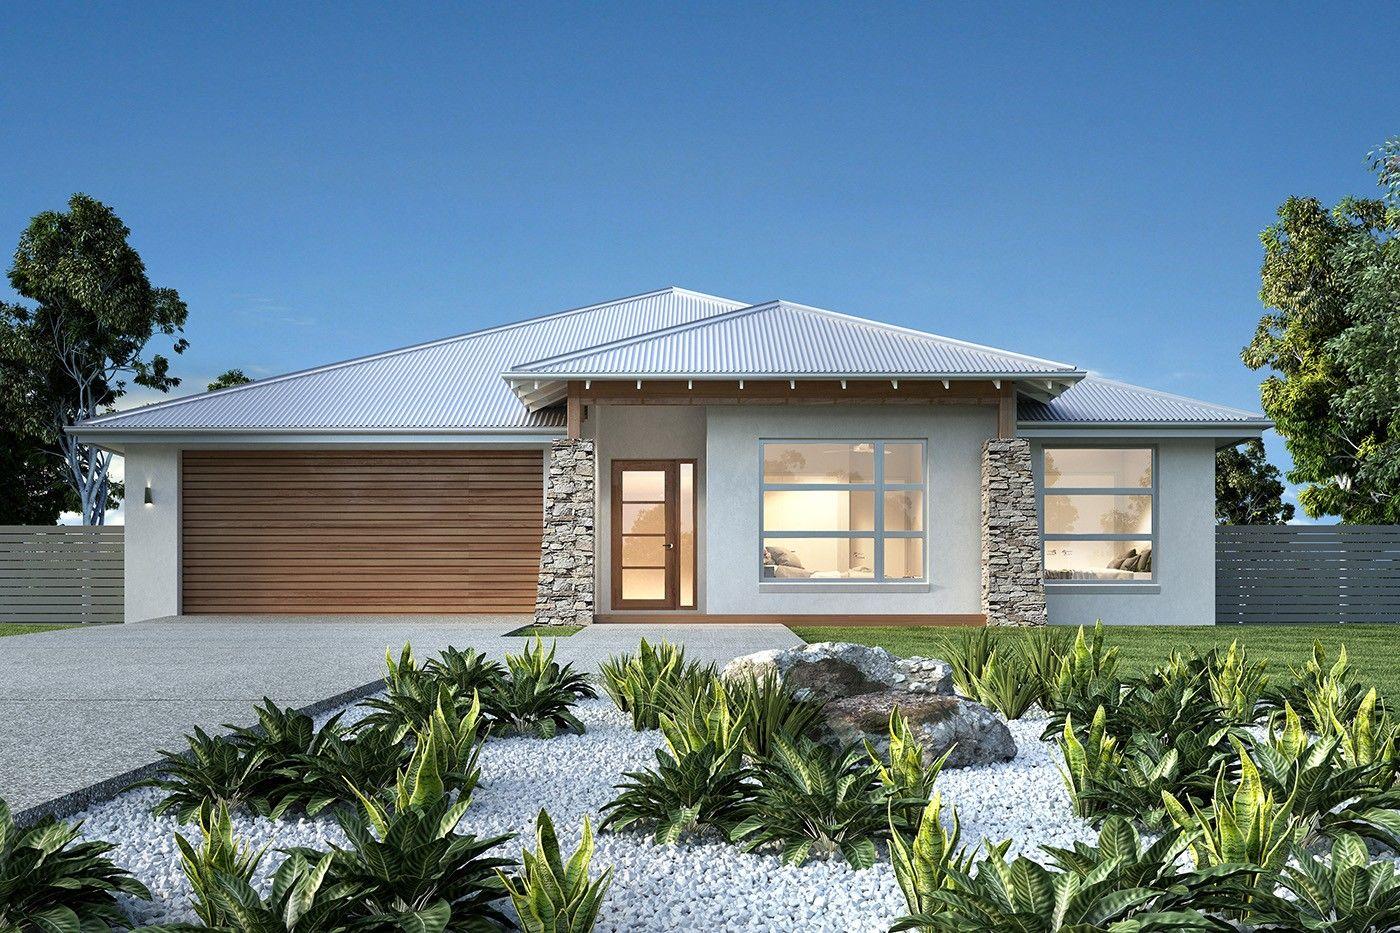 Lot 182 Premier Drive, Kingaroy QLD 4610, Image 0